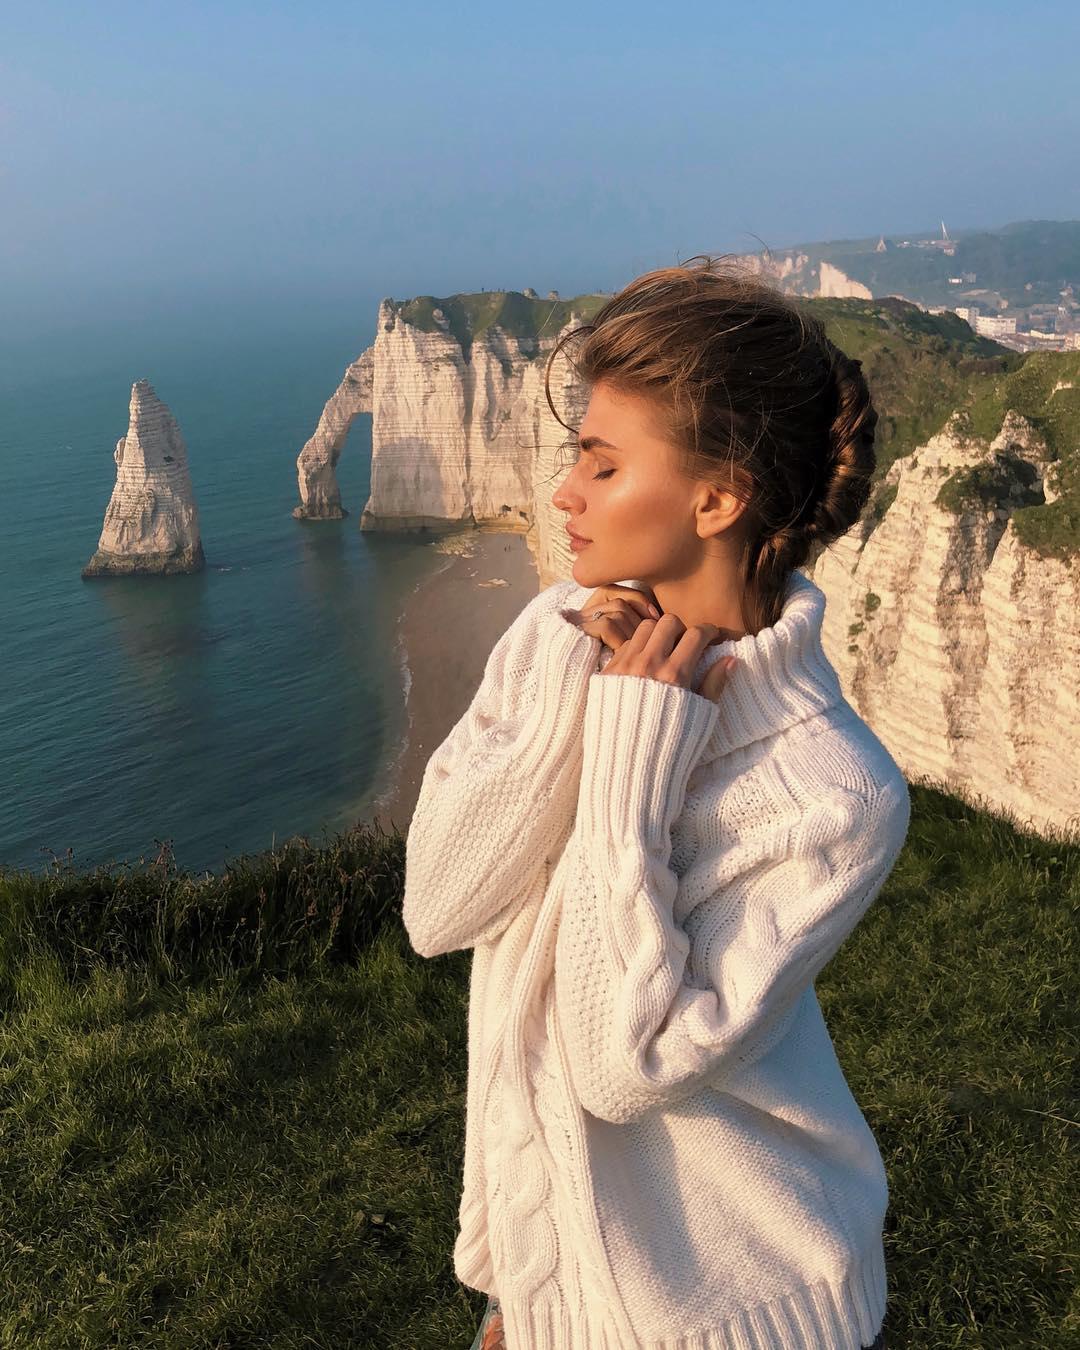 Anastasia-Mironova-Wallpapers-Insta-Fit-Bio-3